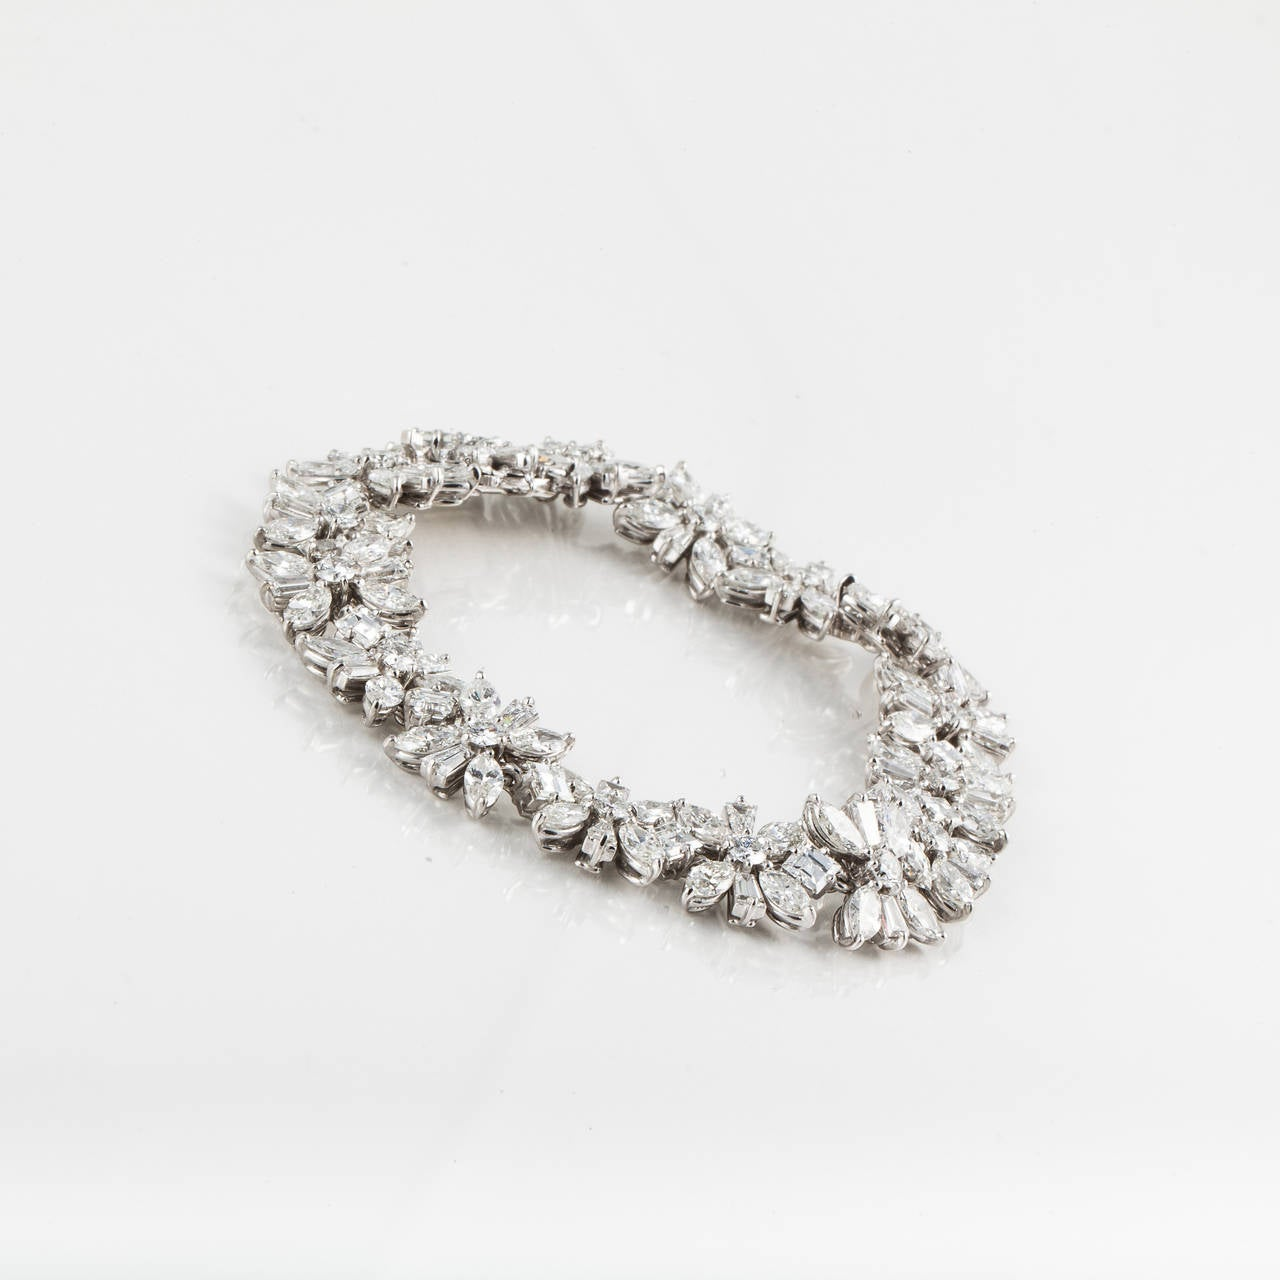 1950s Cartier Diamond Platinum Bracelet In Excellent Condition For Sale In Houston, TX